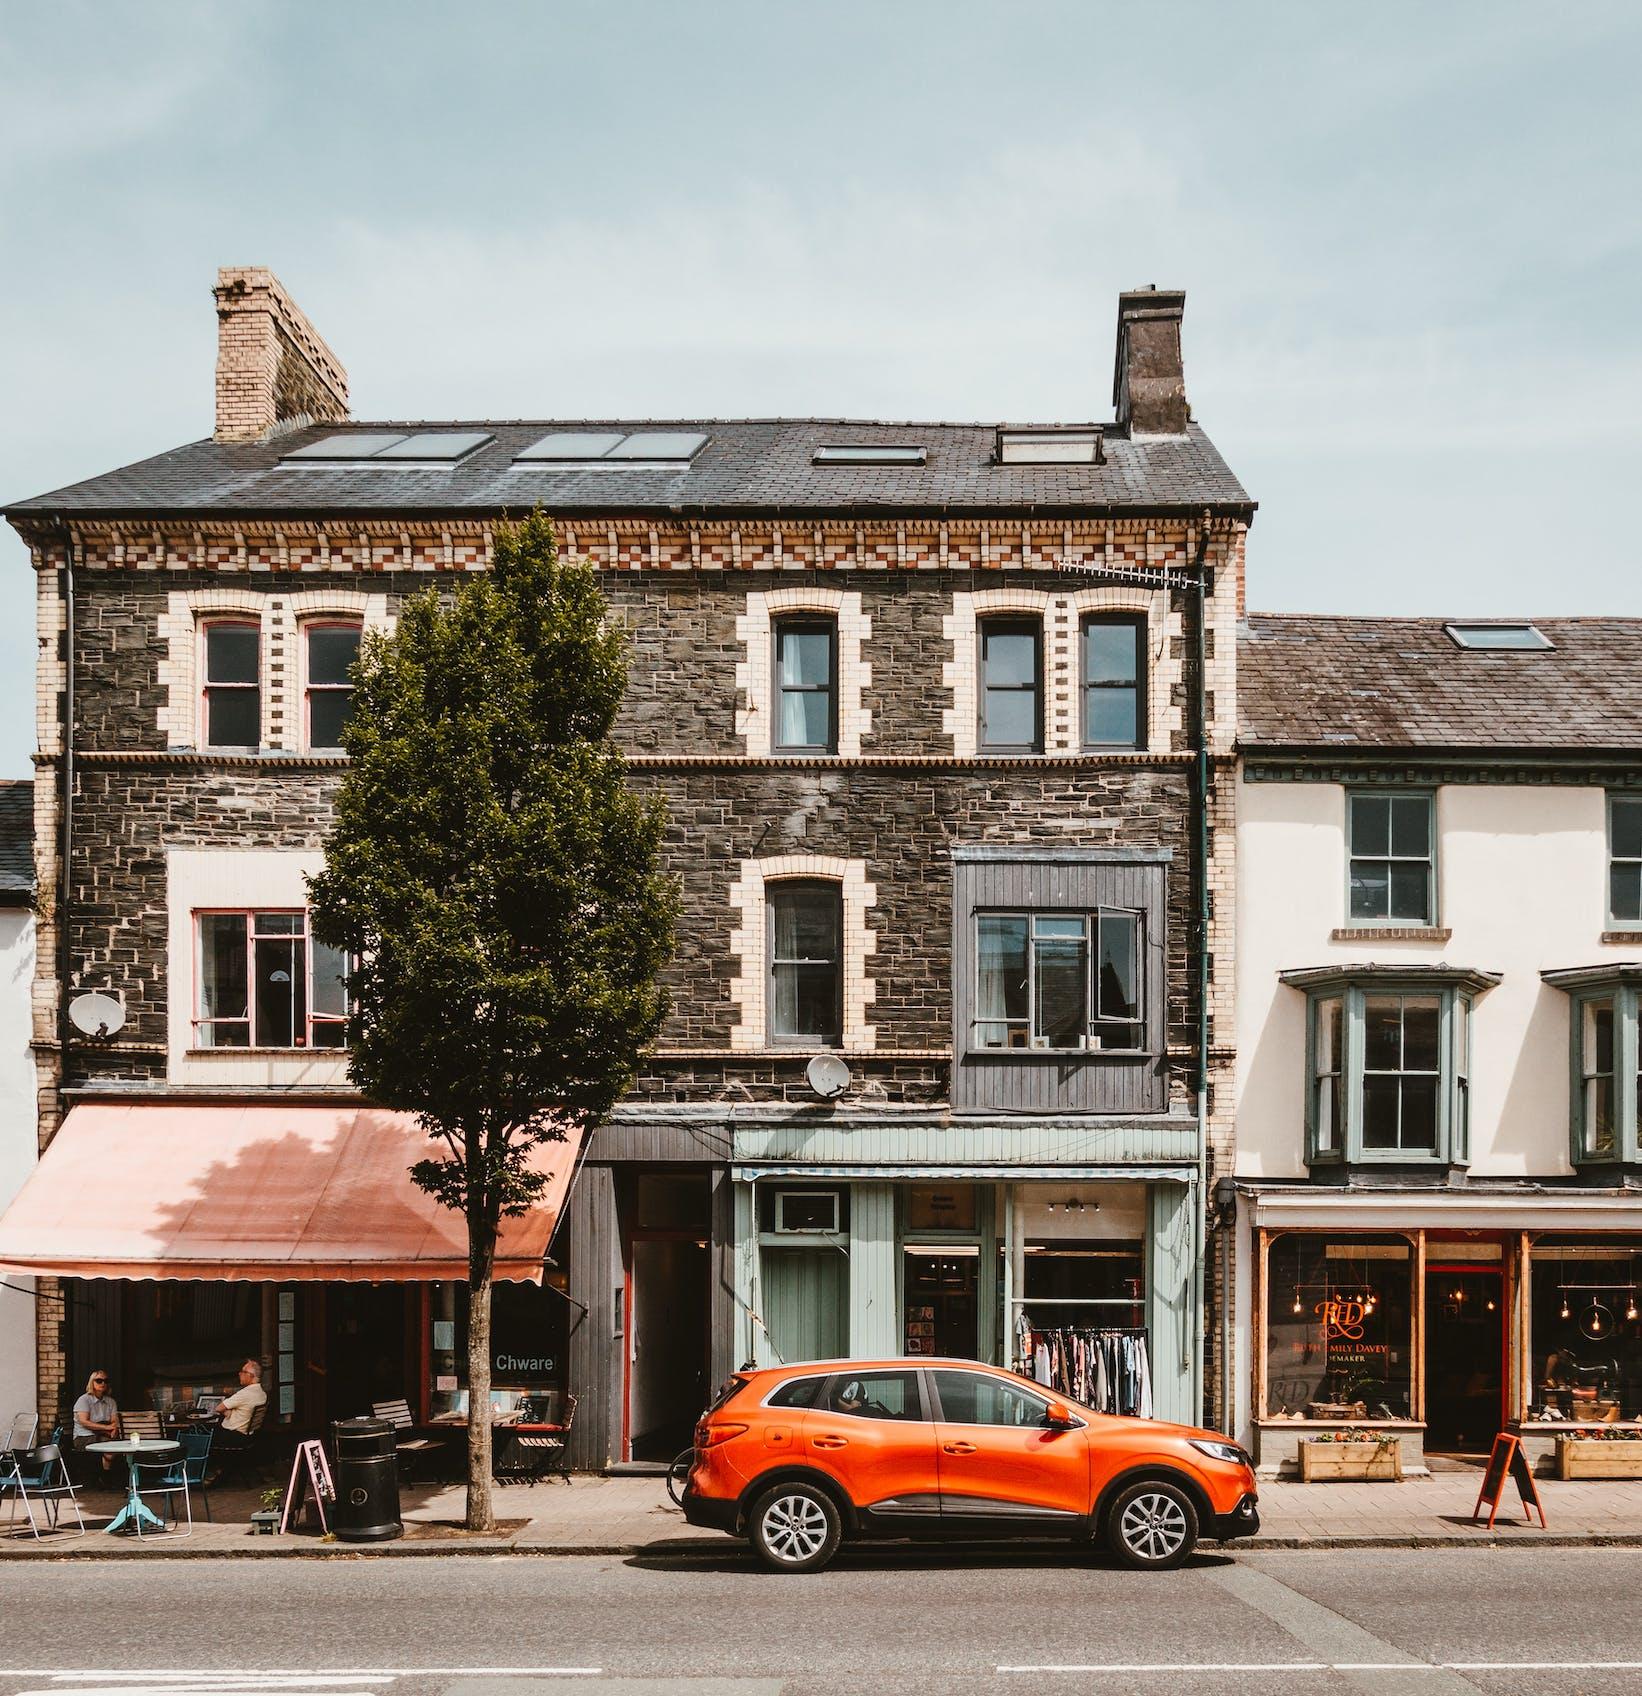 Orange car in town